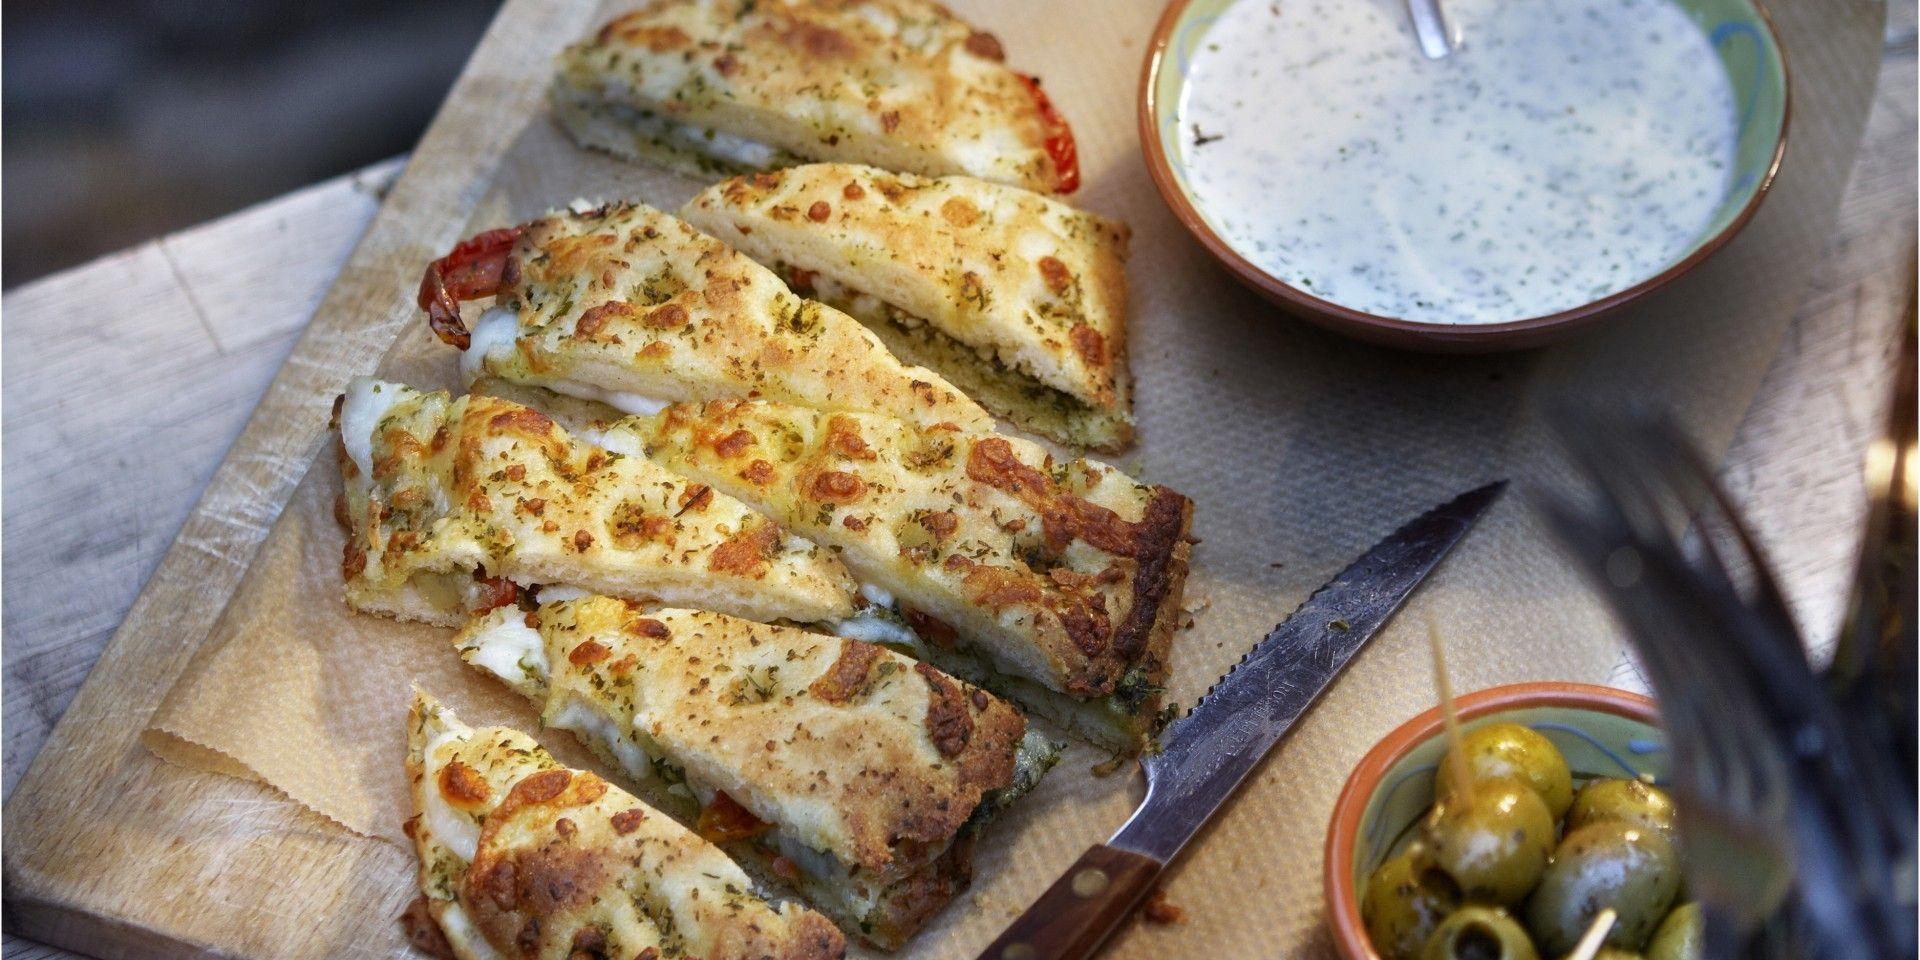 Boodschappen - Focaccia met mozzarella